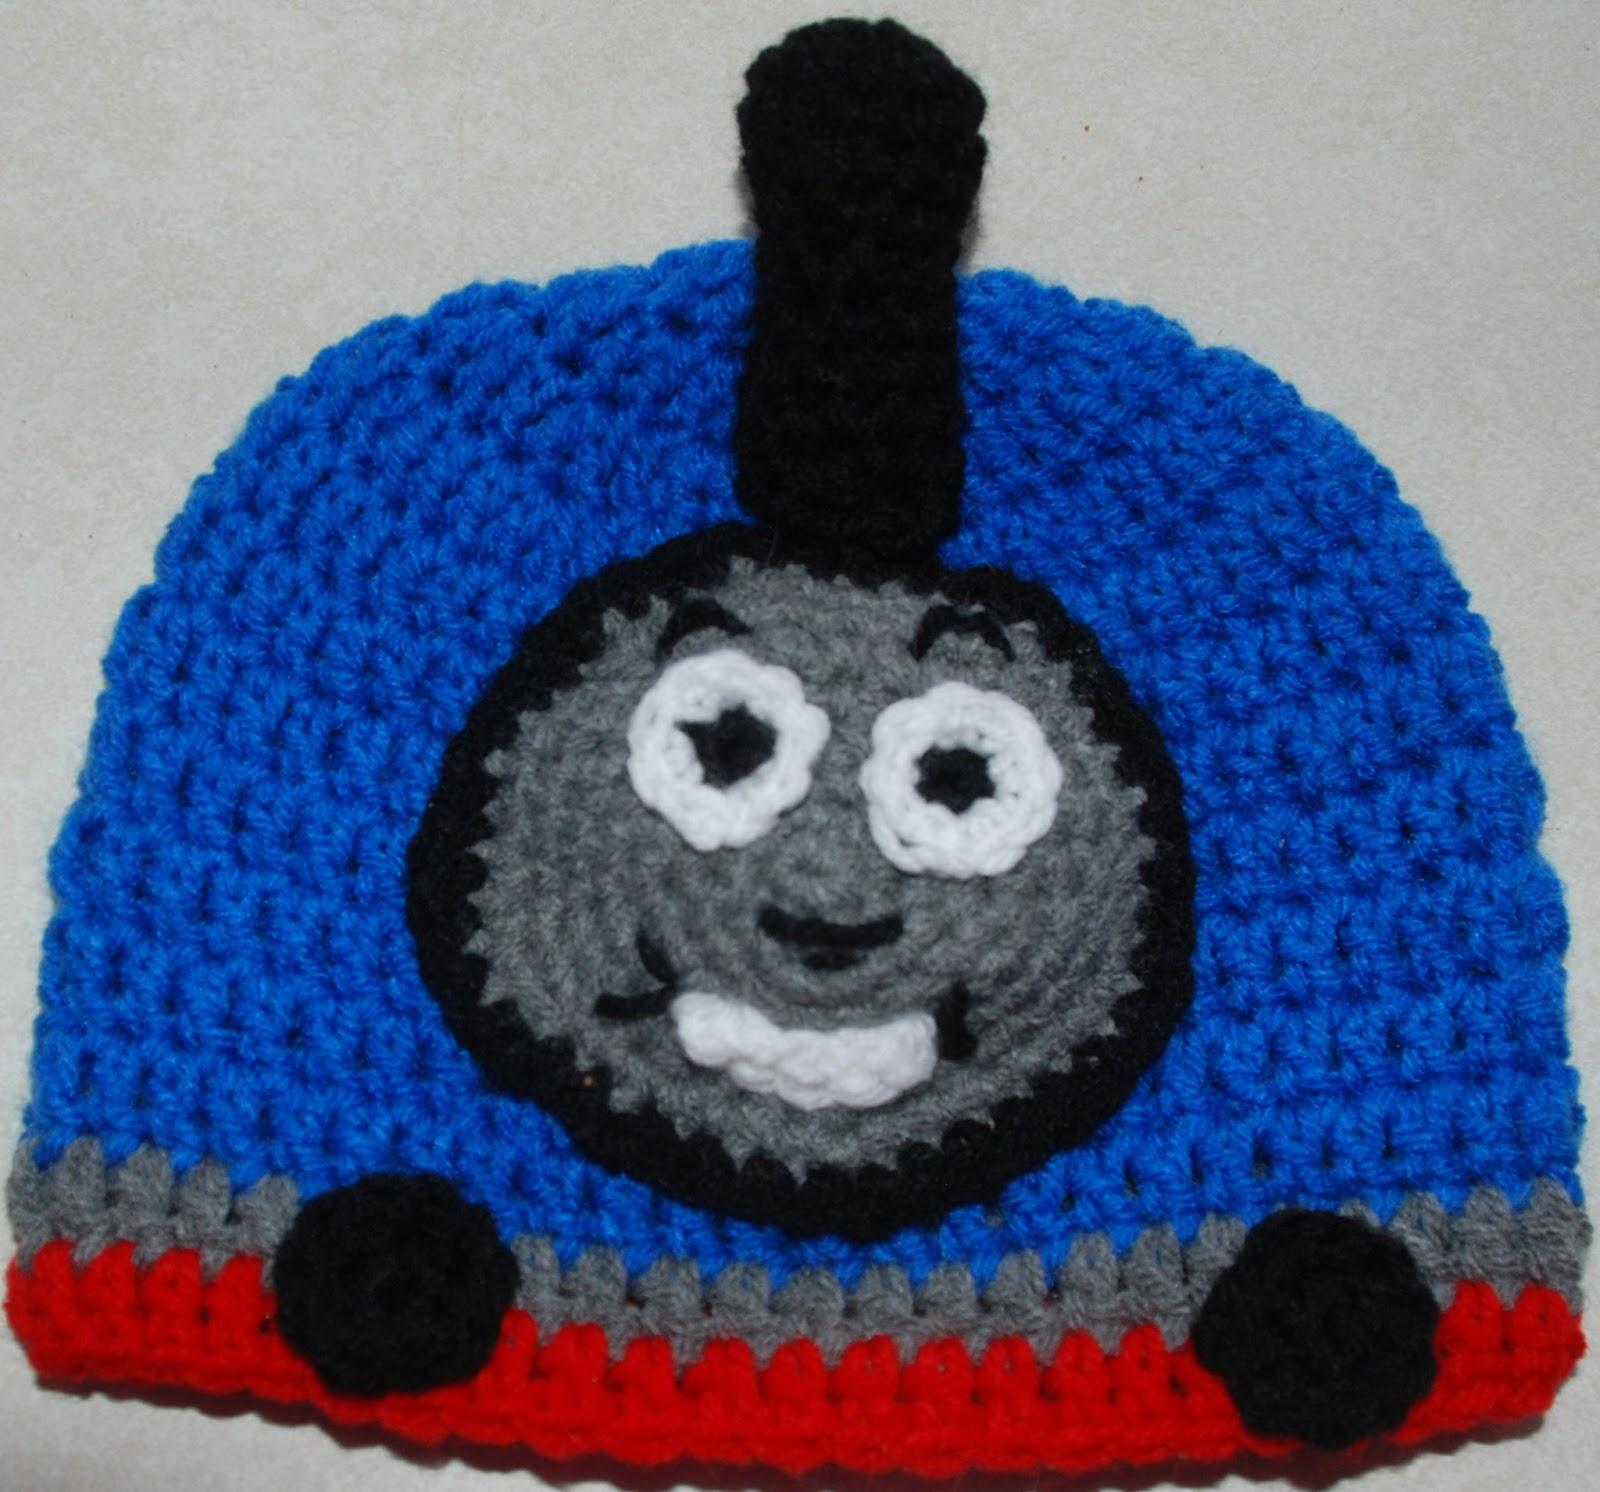 Free Crochet Hat Pattern For Thomas The Train : Amys Crochet Creative Creations: Crochet Thomas the Train Hat